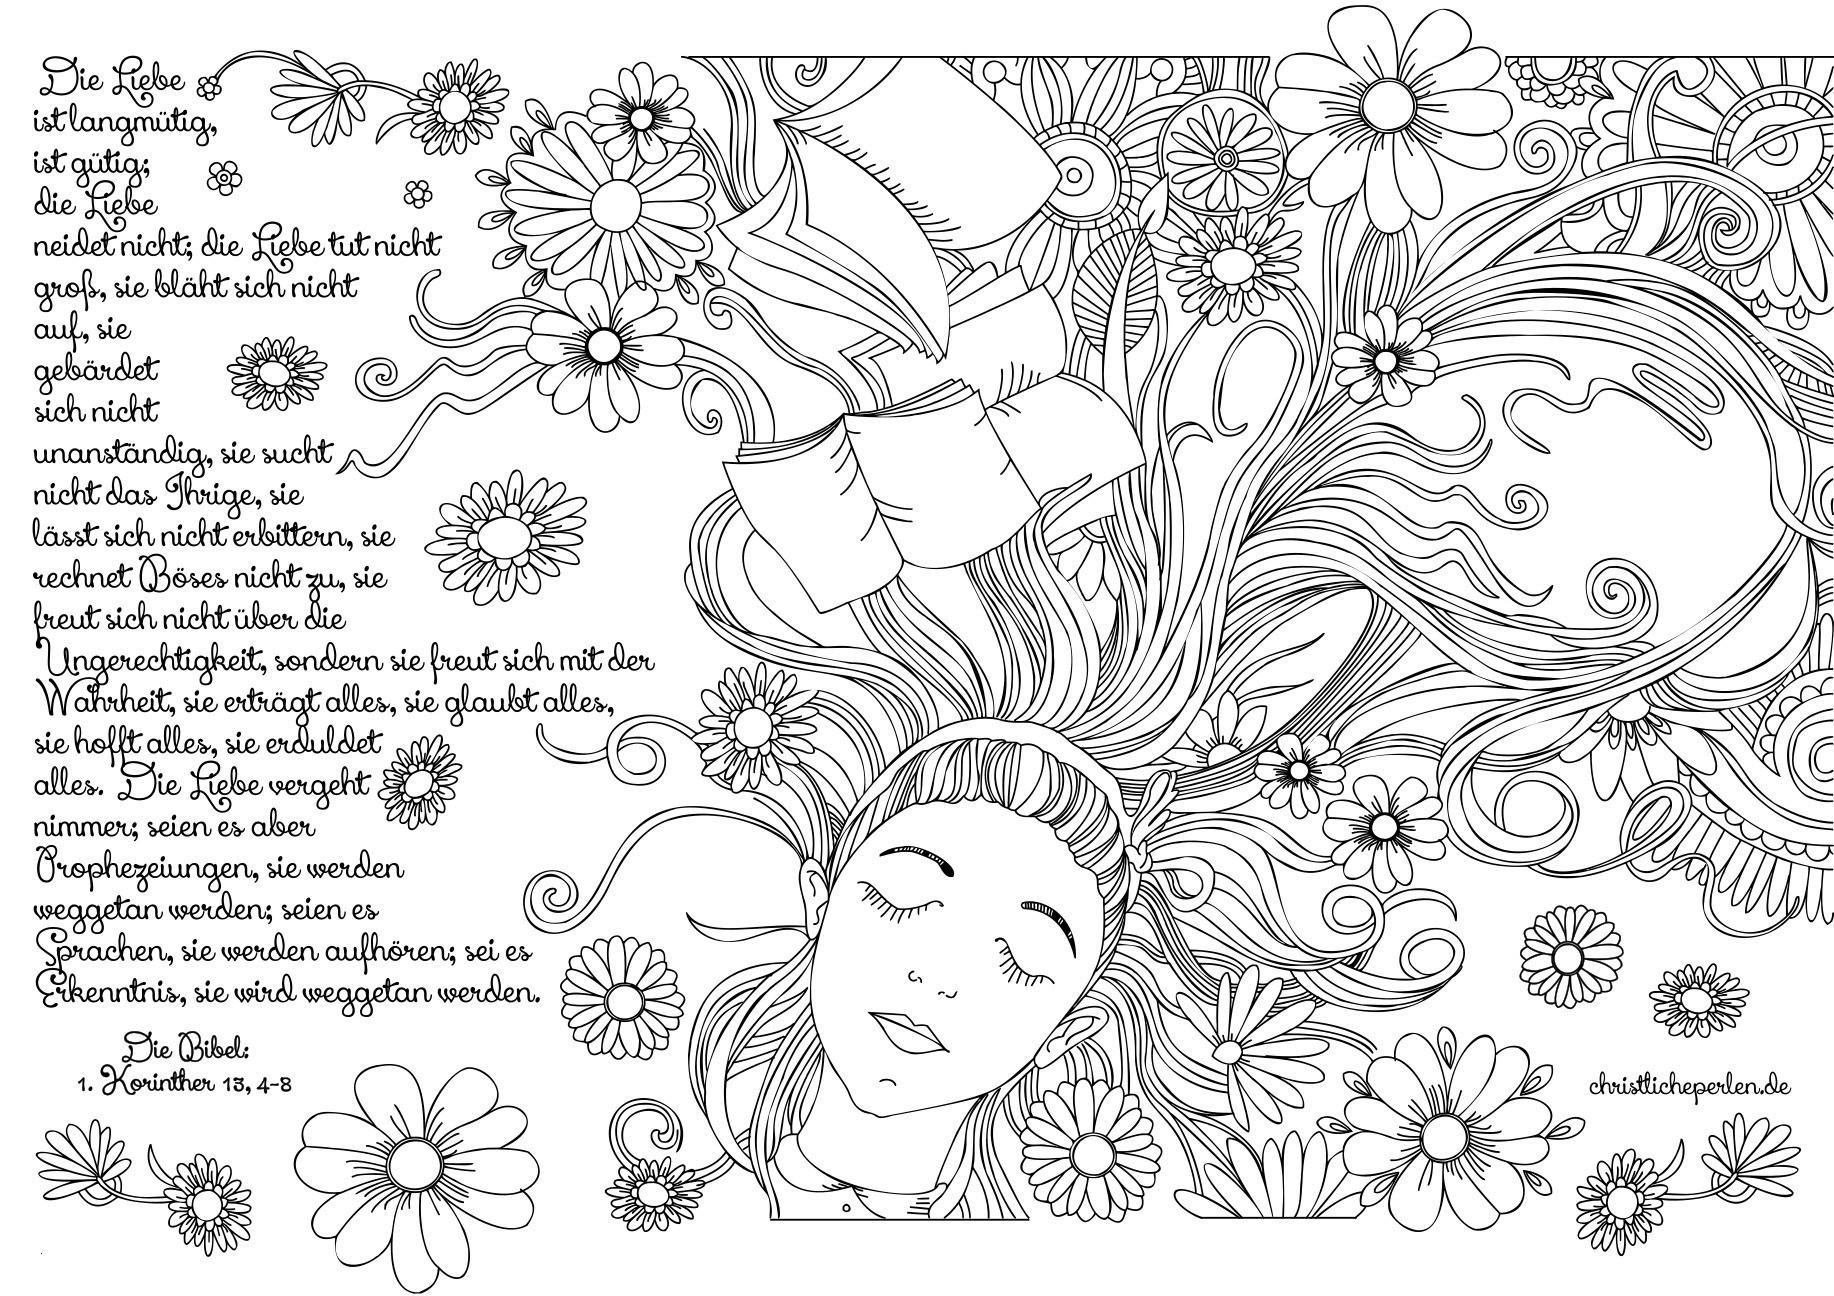 Minnie Maus Malvorlage Genial Die Maus Ausmalbilder Beautiful Coloring Page Neu Minni Maus Stock